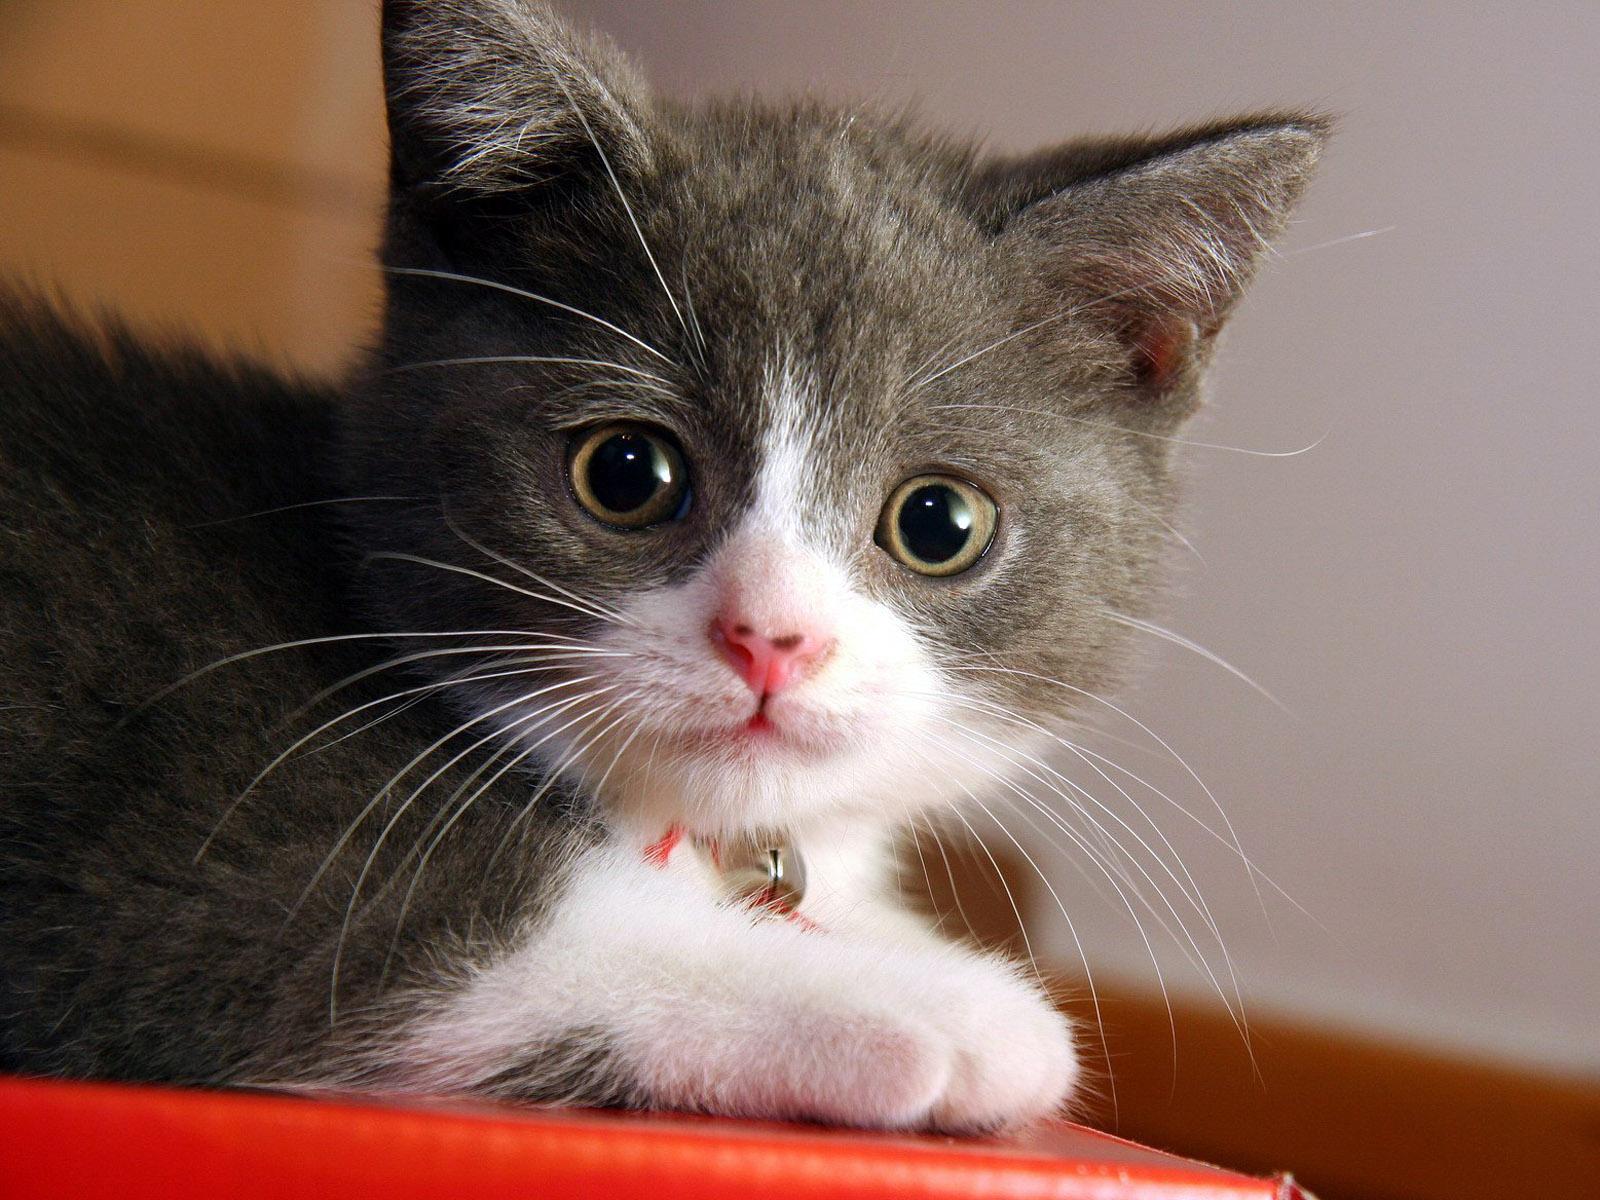 http://3.bp.blogspot.com/-9-nM9_TzH9o/UDCUDi-rQSI/AAAAAAAAAPQ/nqqjgwbderY/s1600/Top+20+Cute+Animals+Pics8.jpg